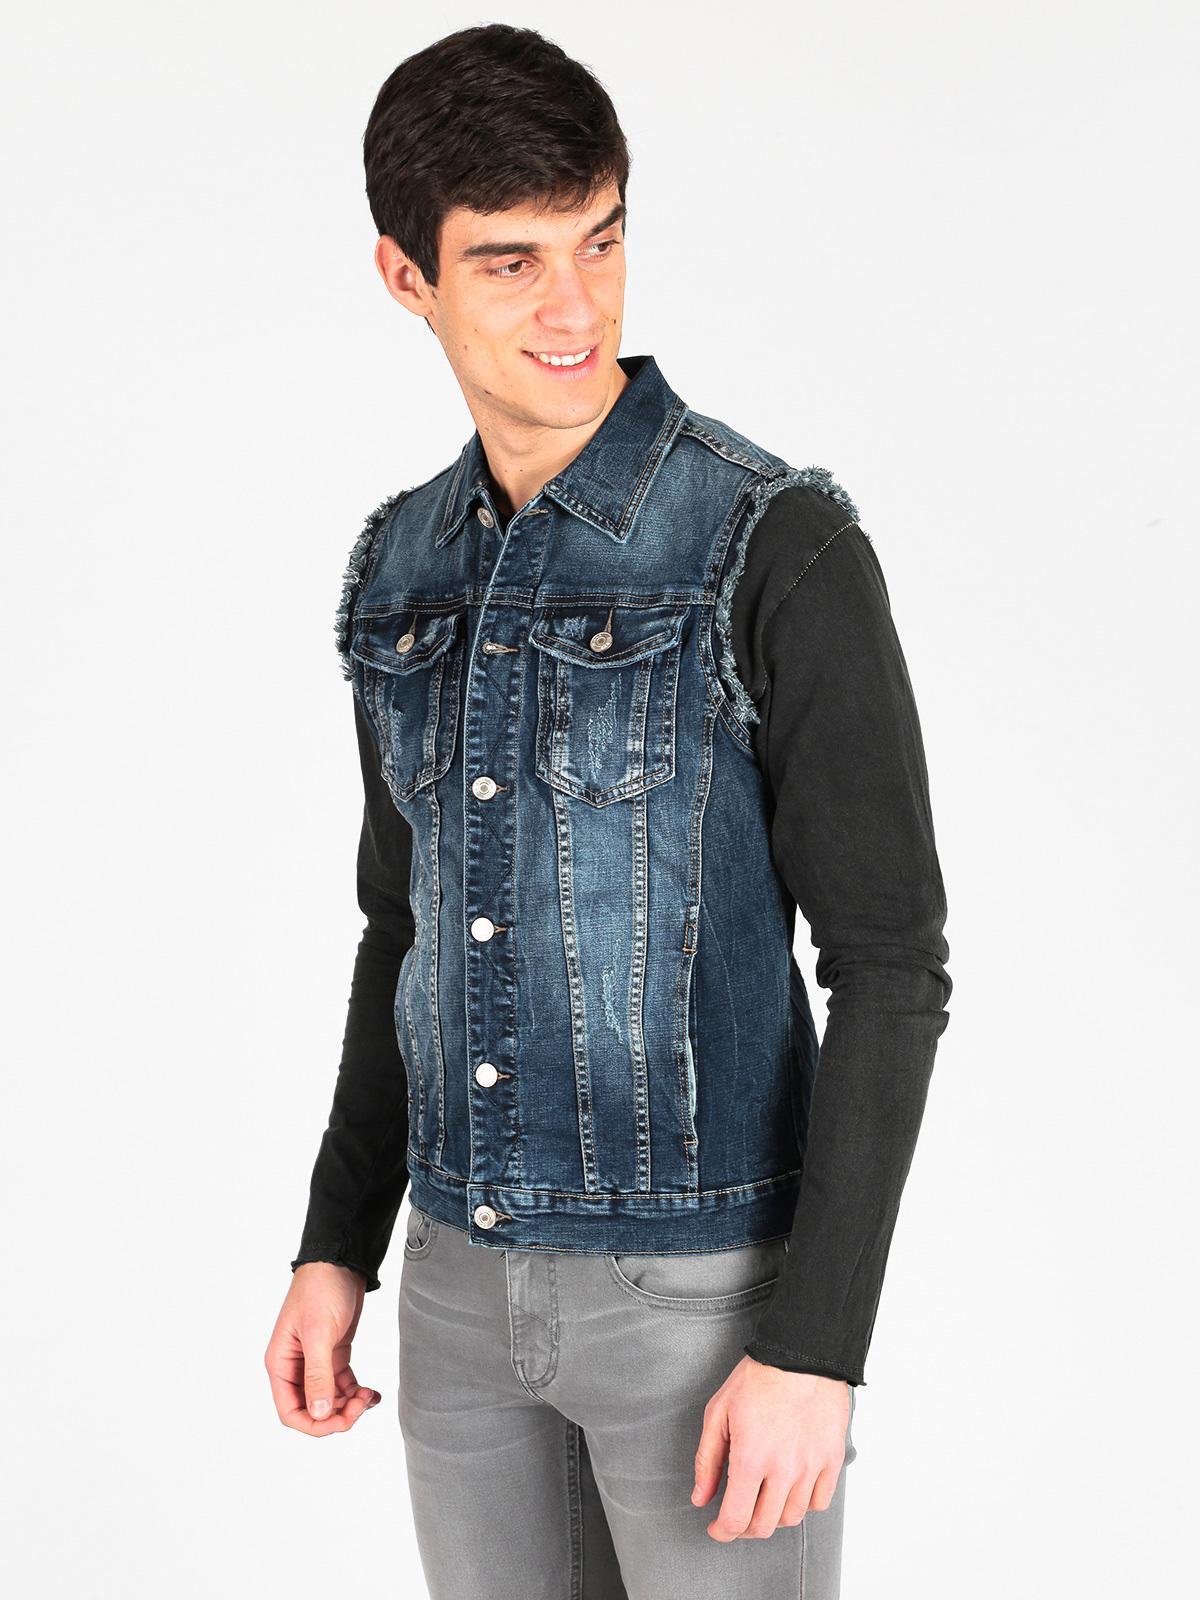 outlet store sale 3fa2e 67741 Gilet di jeans da uomo accross | MecShopping